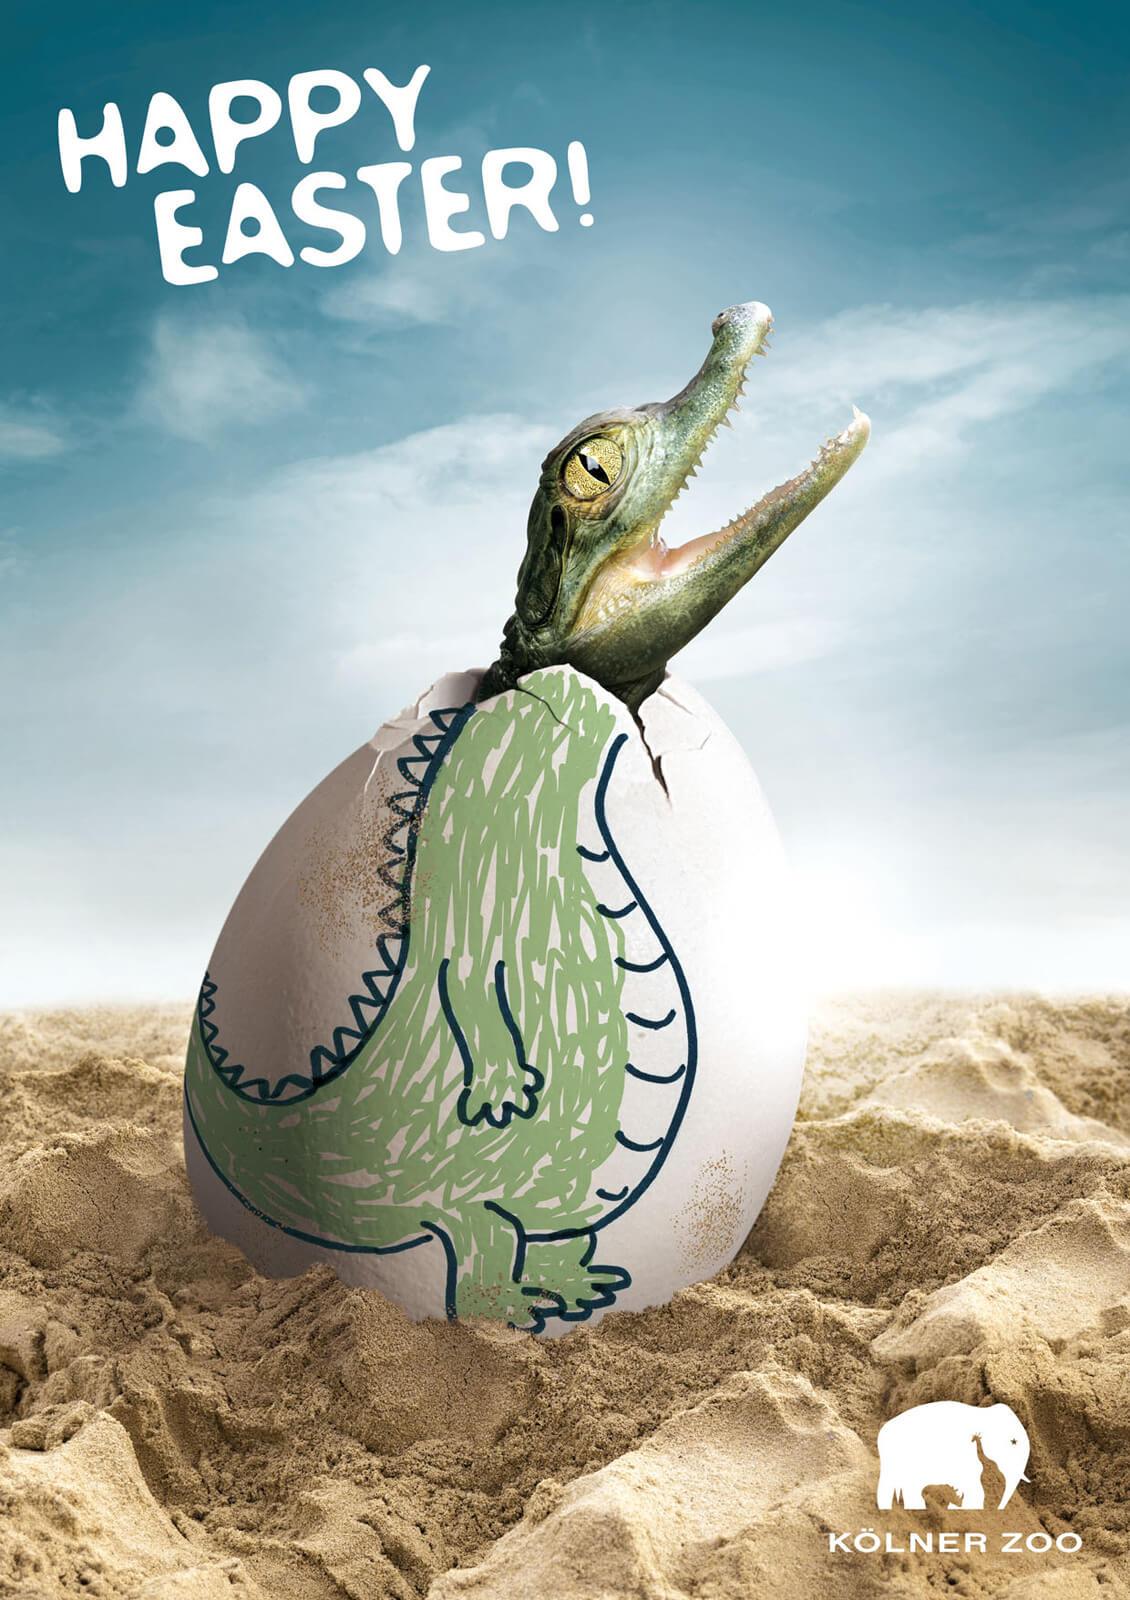 Kolner Zoo Easter Ad 4